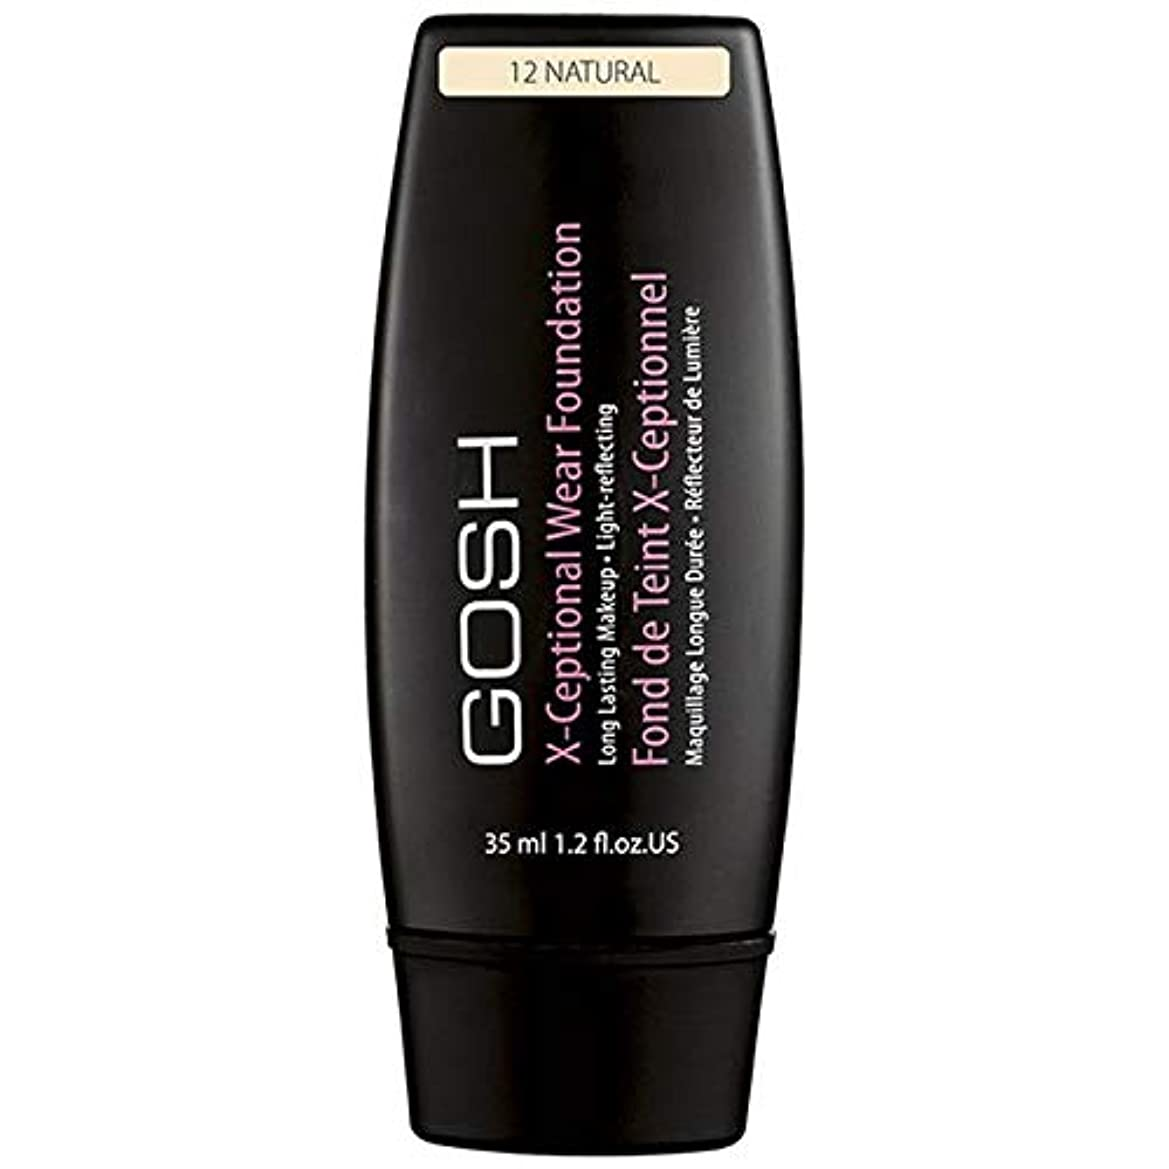 [GOSH ] おやっX-Ceptionalナチュラル12を構成して着用 - Gosh X-Ceptional Wear Make Up Natural 12 [並行輸入品]